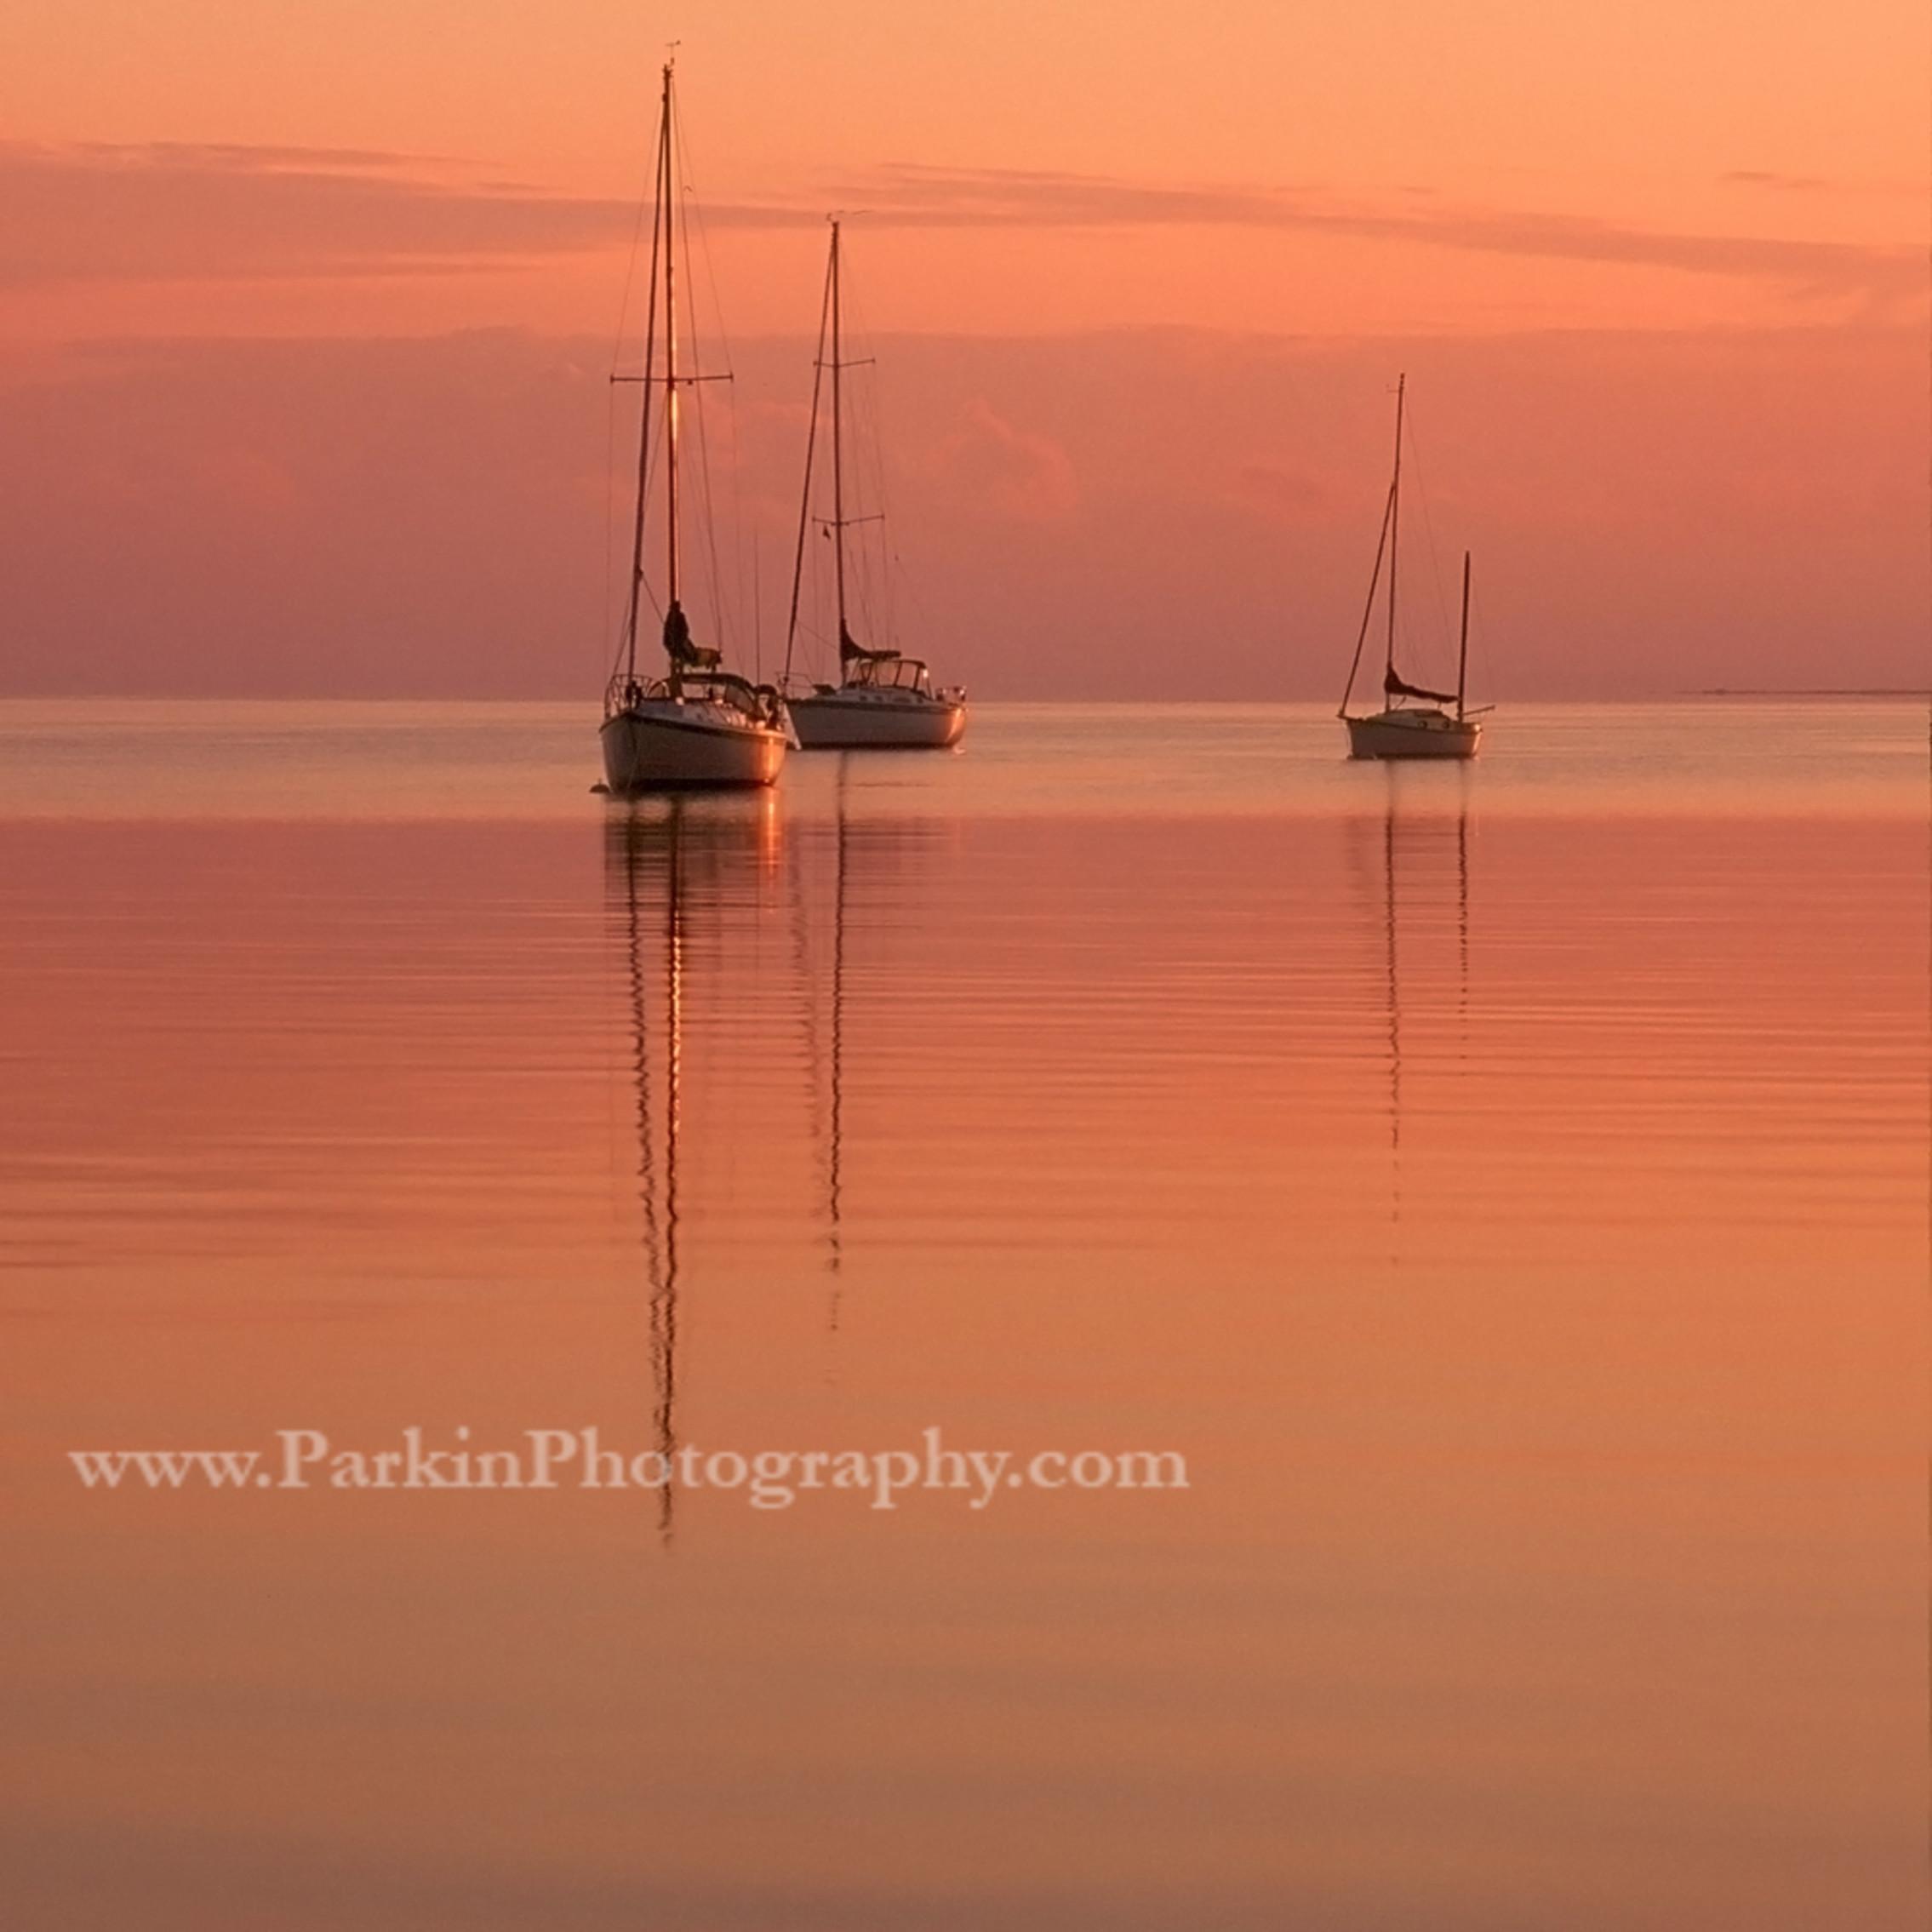 Morning on sutton s bay asf rtgkic